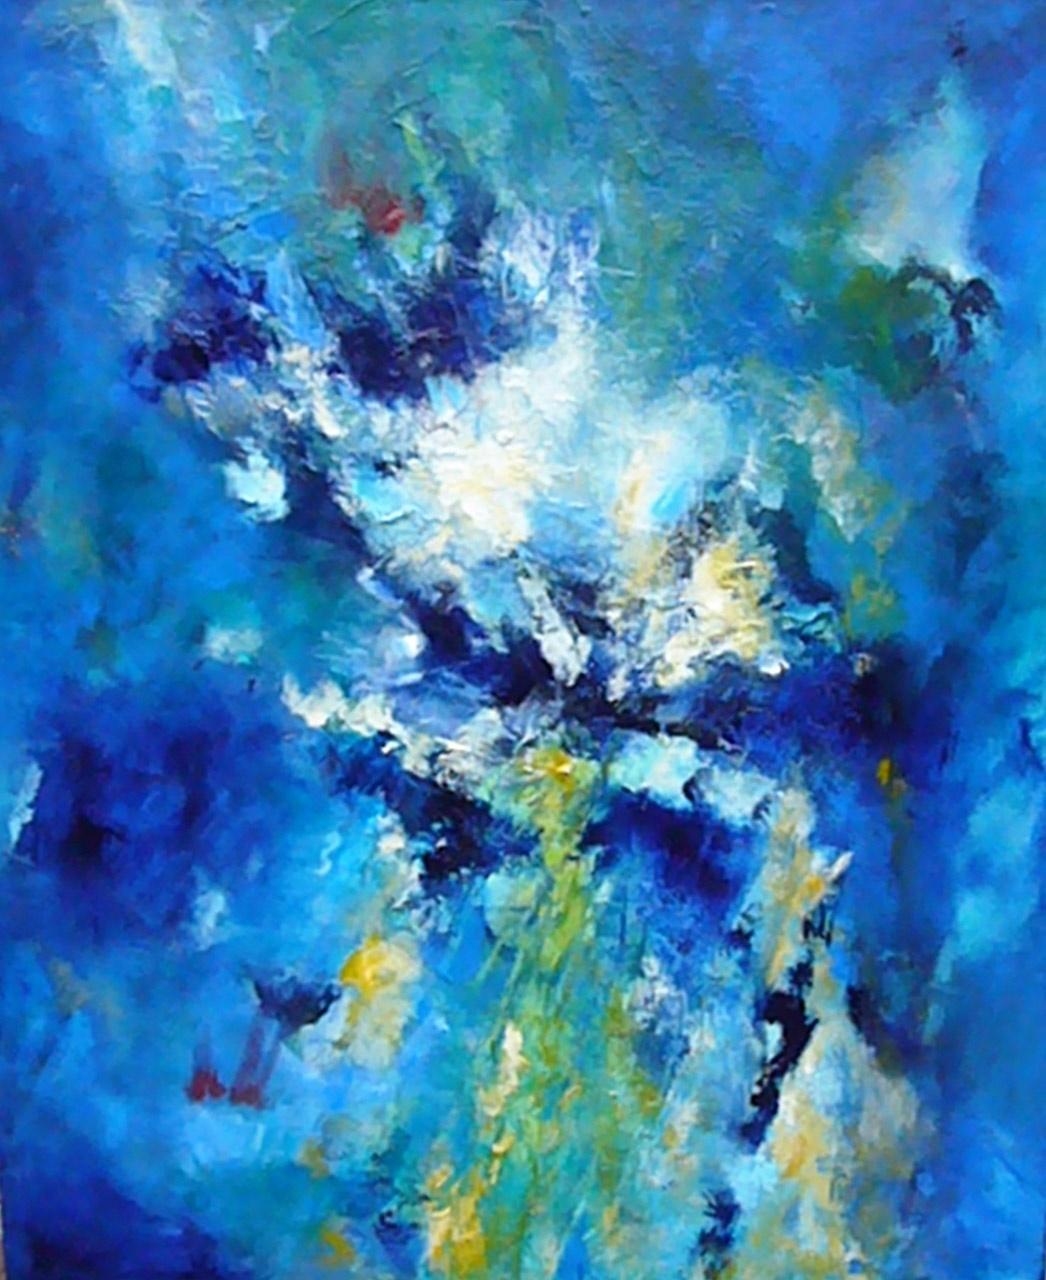 Riet Siemons_Waterval_acryl op katoen_60x50